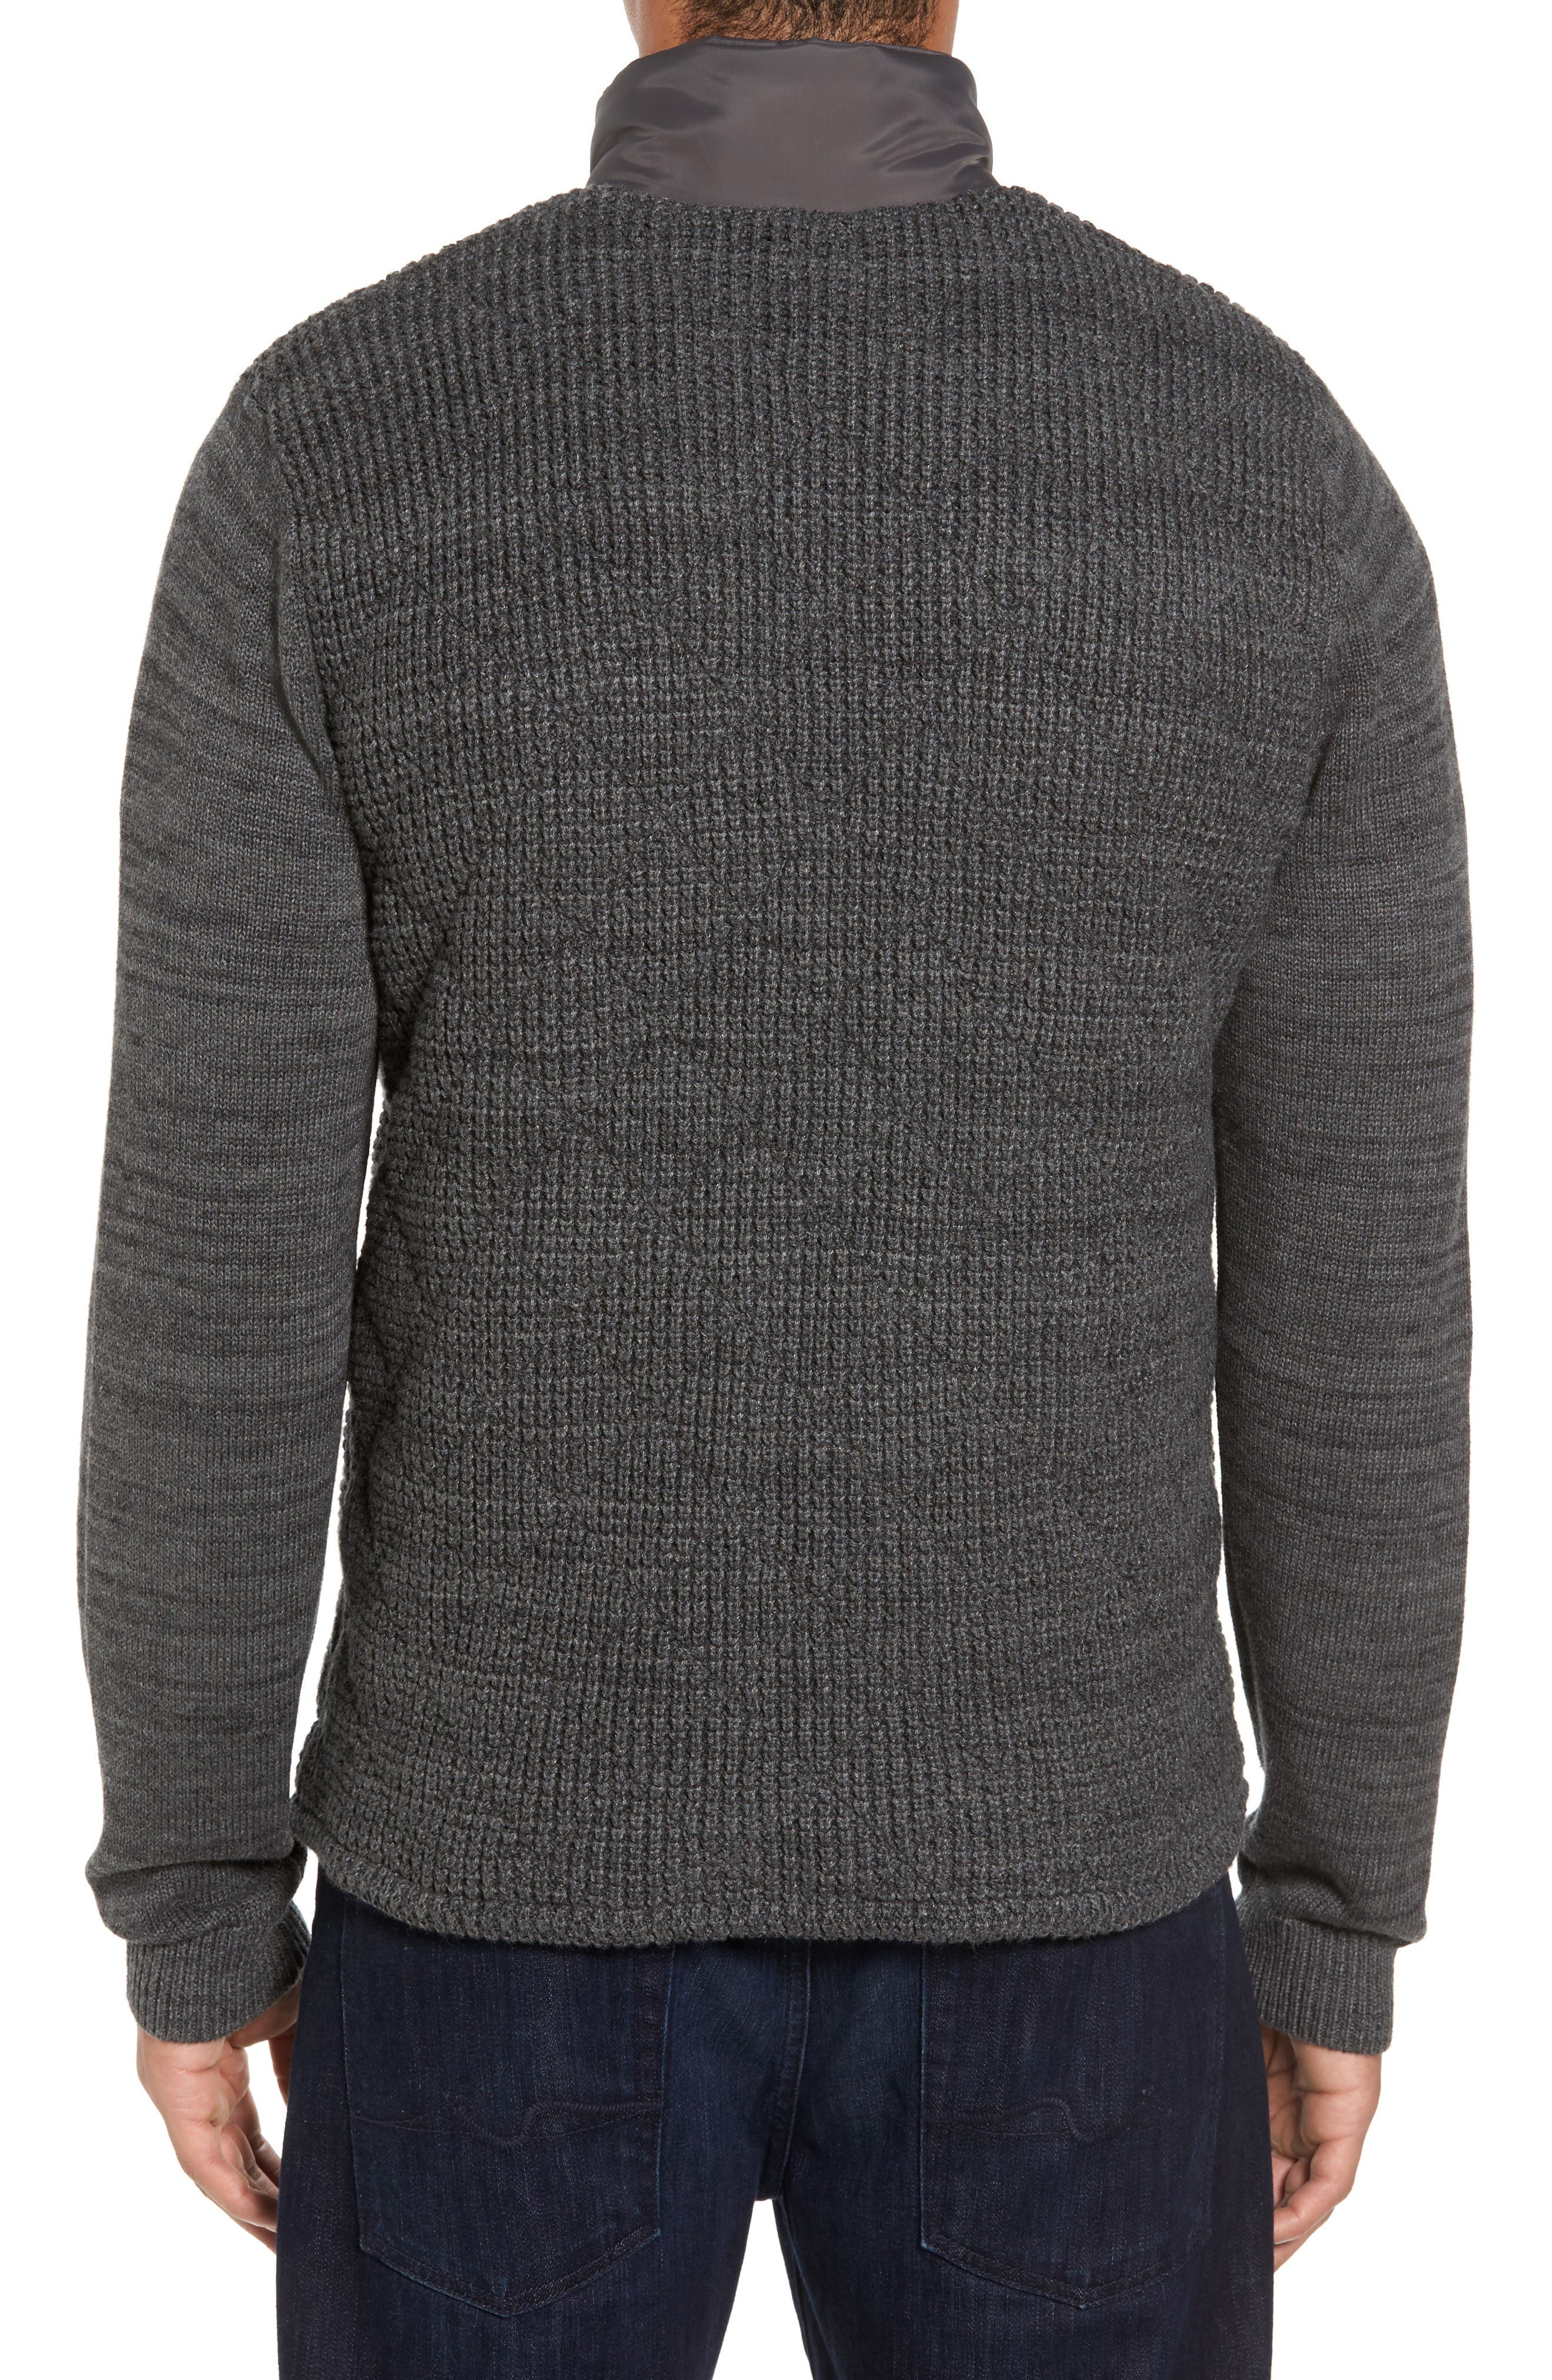 Alternate Image 2  - Calibrate Mixed Media Full Zip Sweater